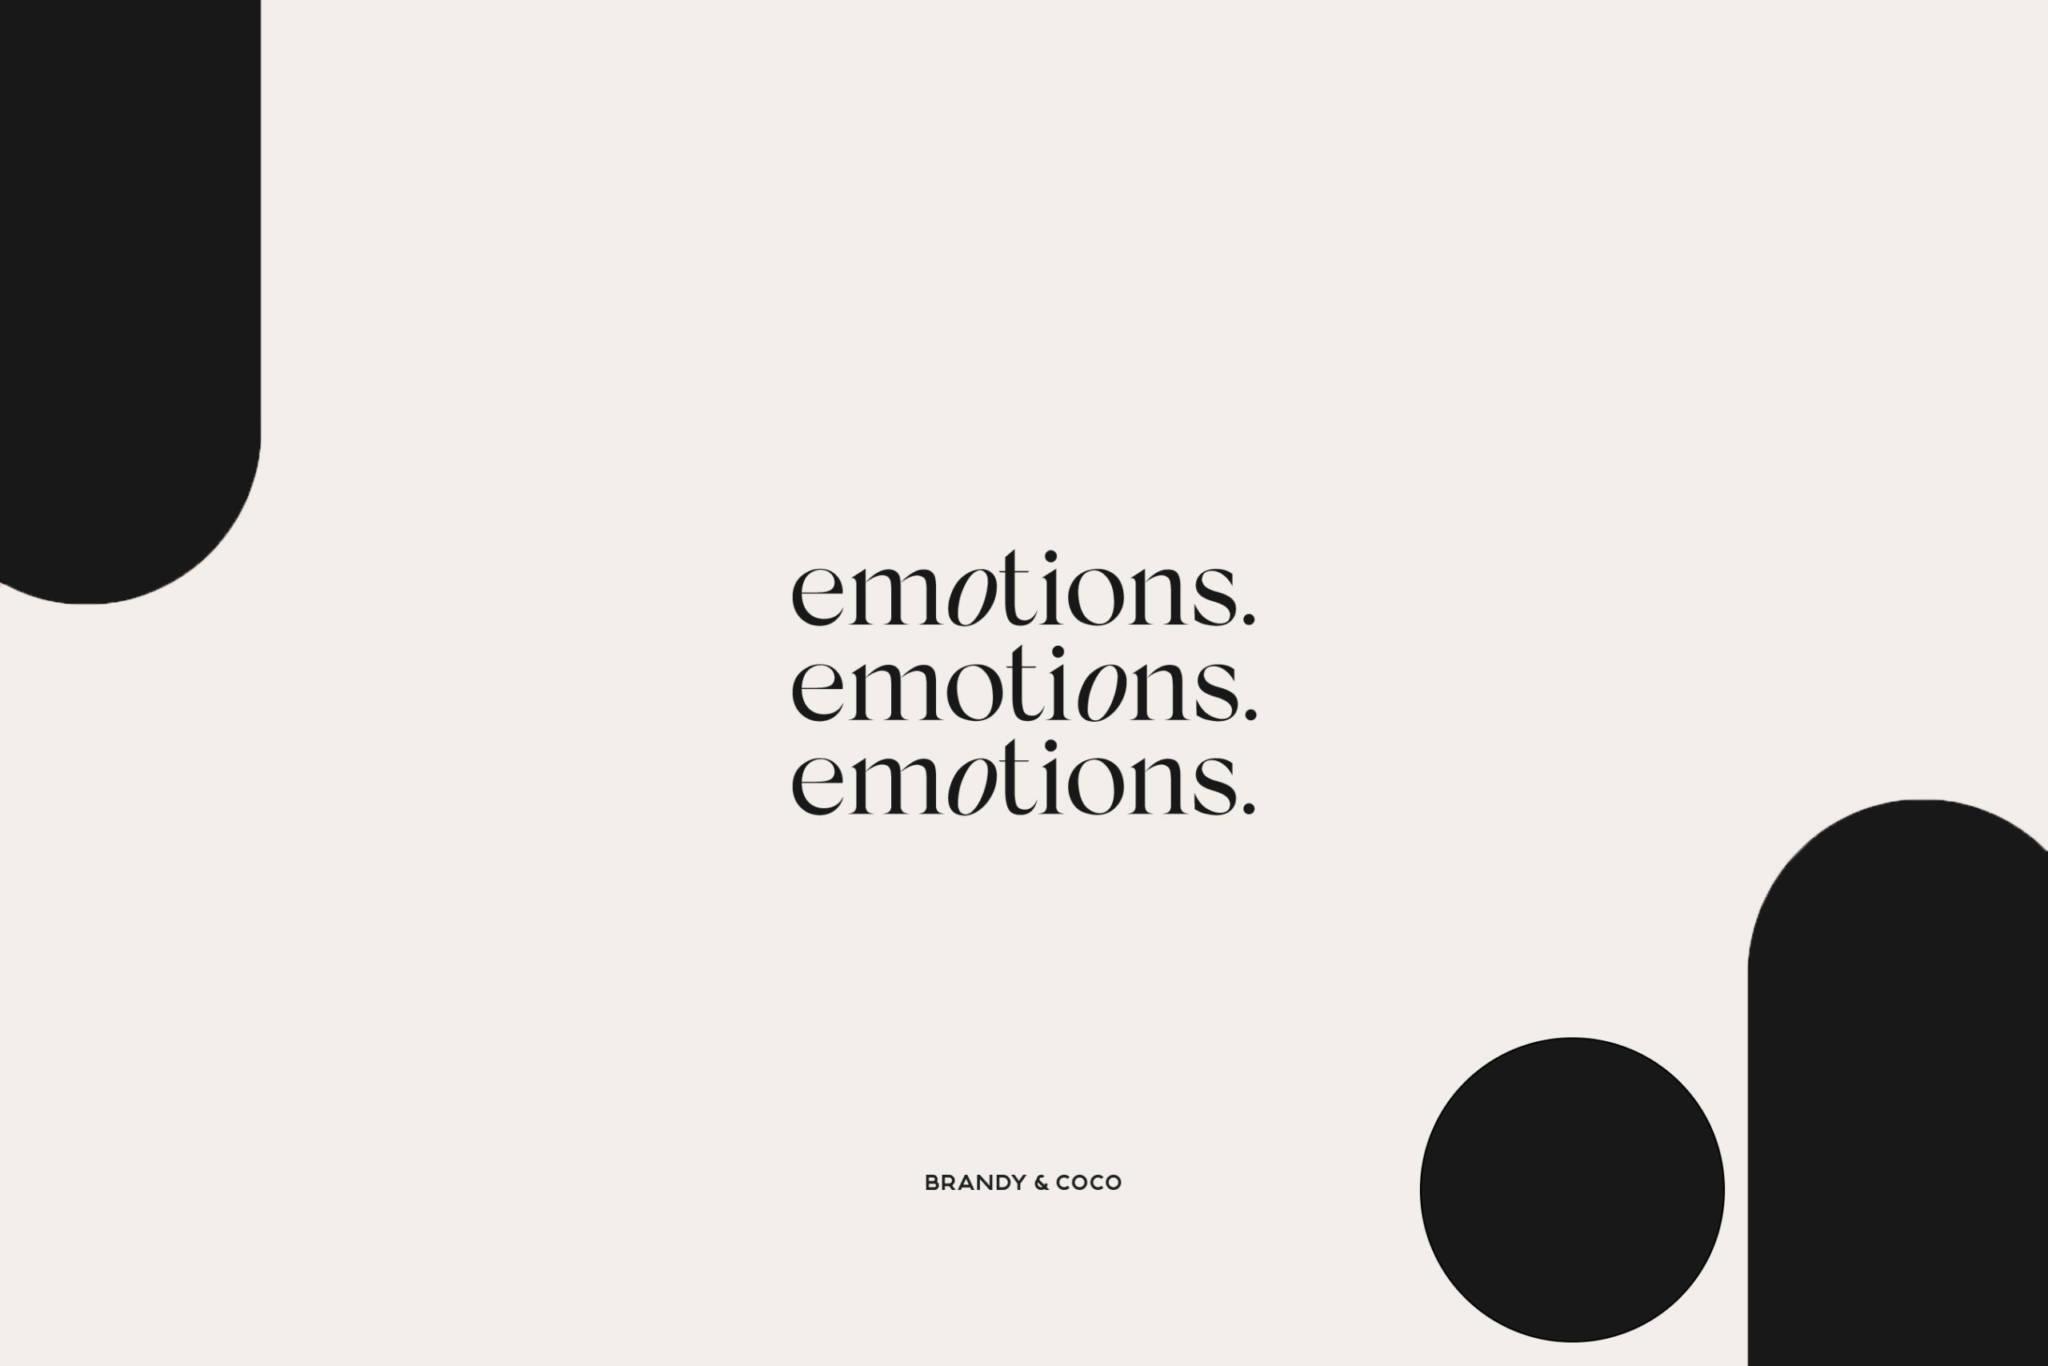 emotions card